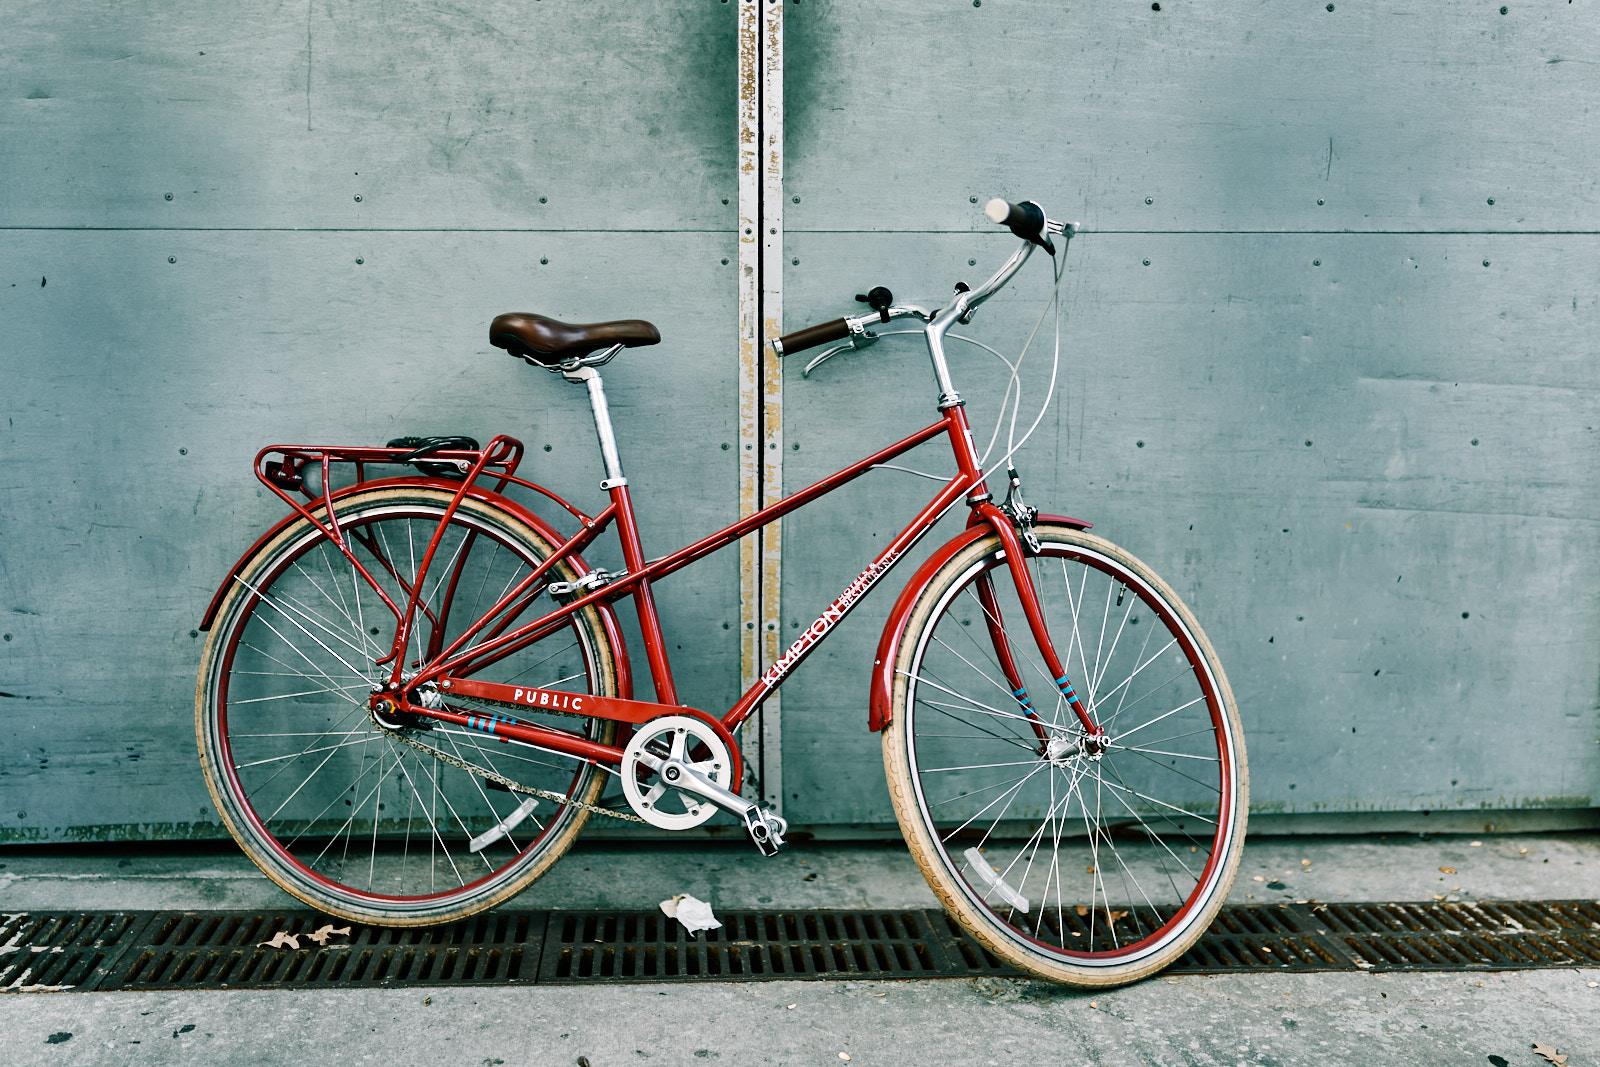 KimpKimpton biketon bike